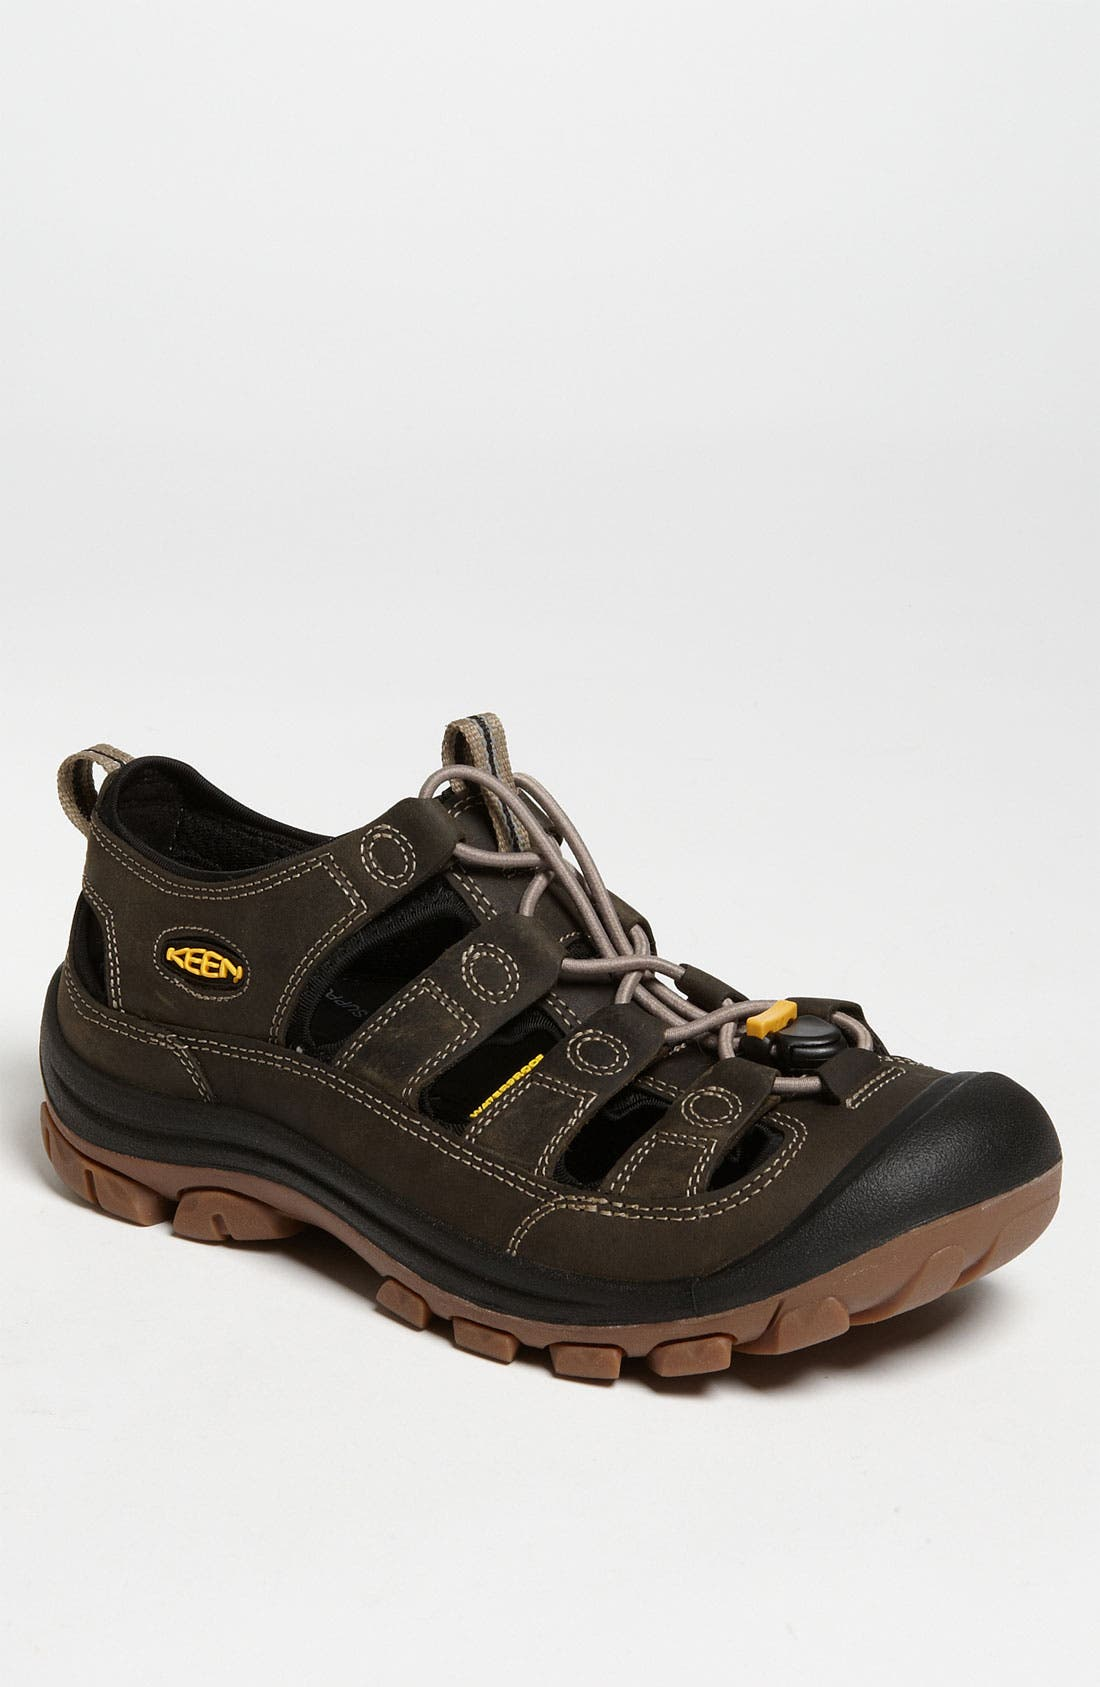 Alternate Image 1 Selected - Keen 'Glisan' Sandal